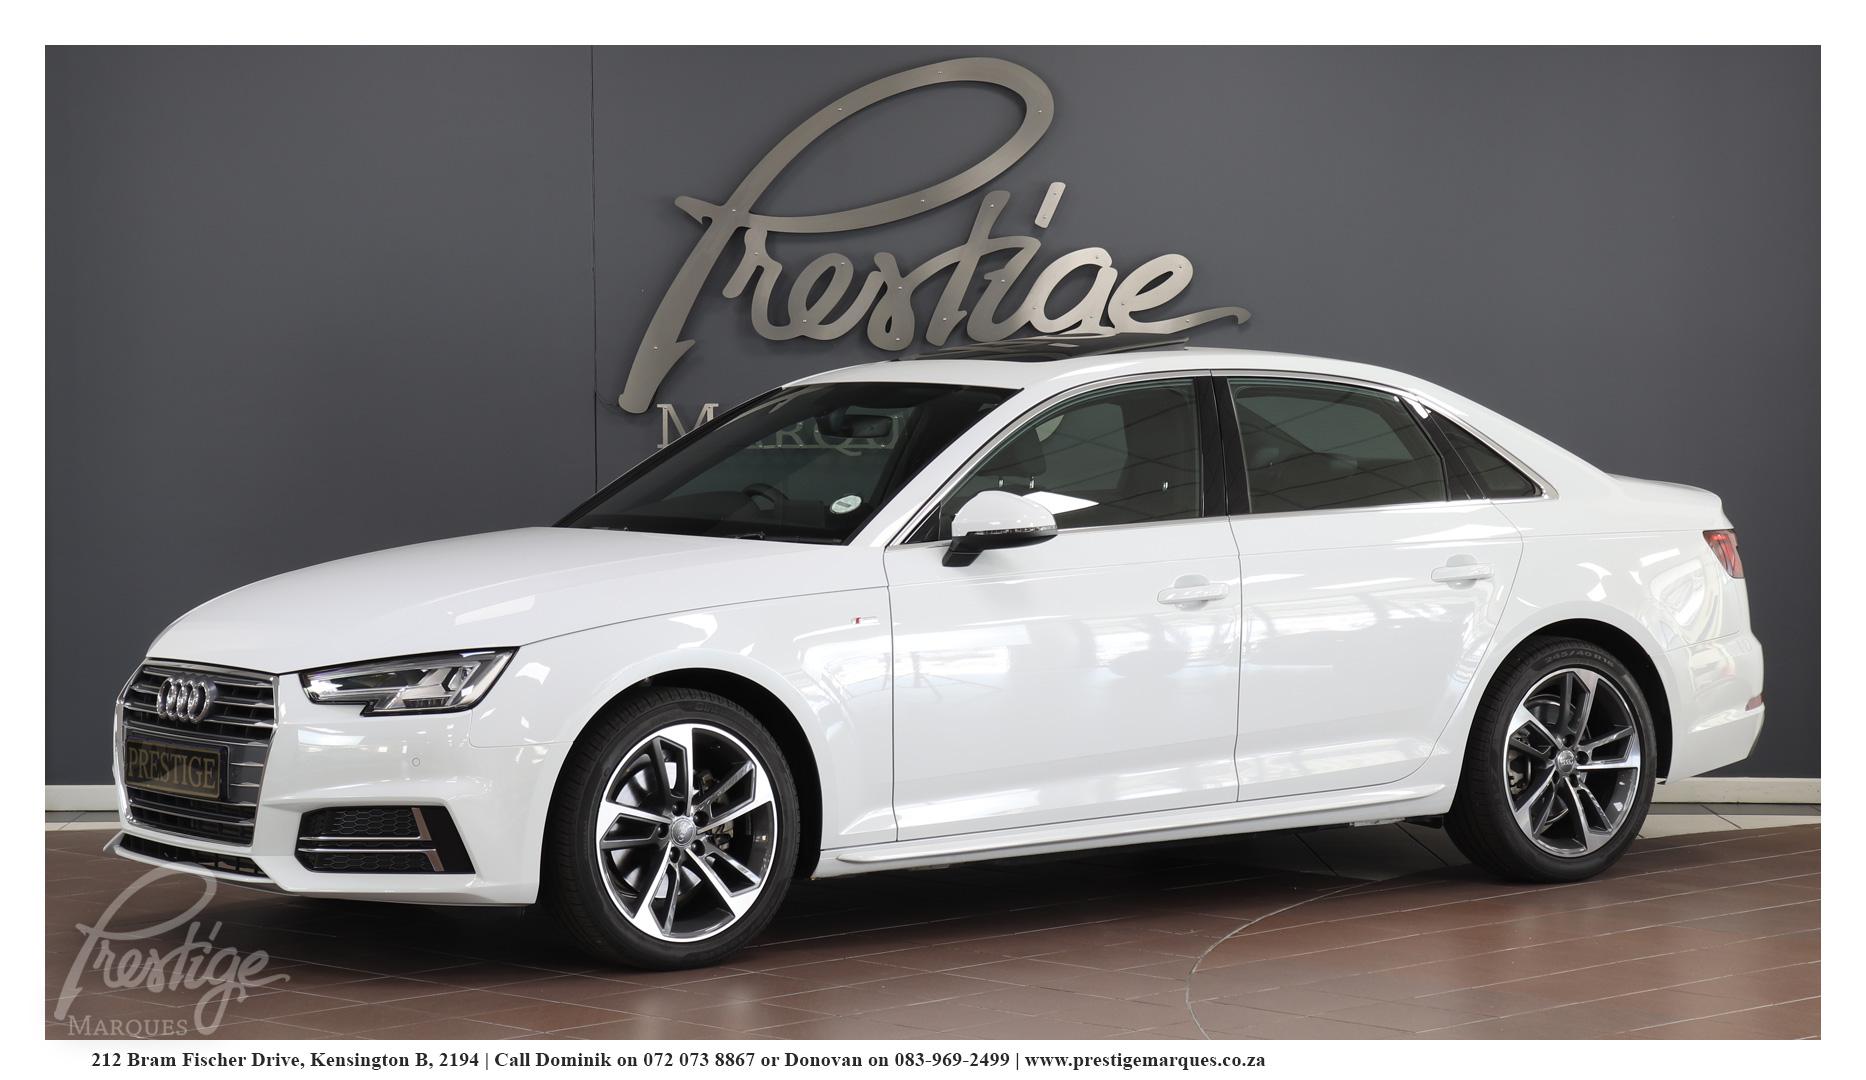 2018-Audi-A4-20-TFSI-STRONIC-Prestige-Marques-7